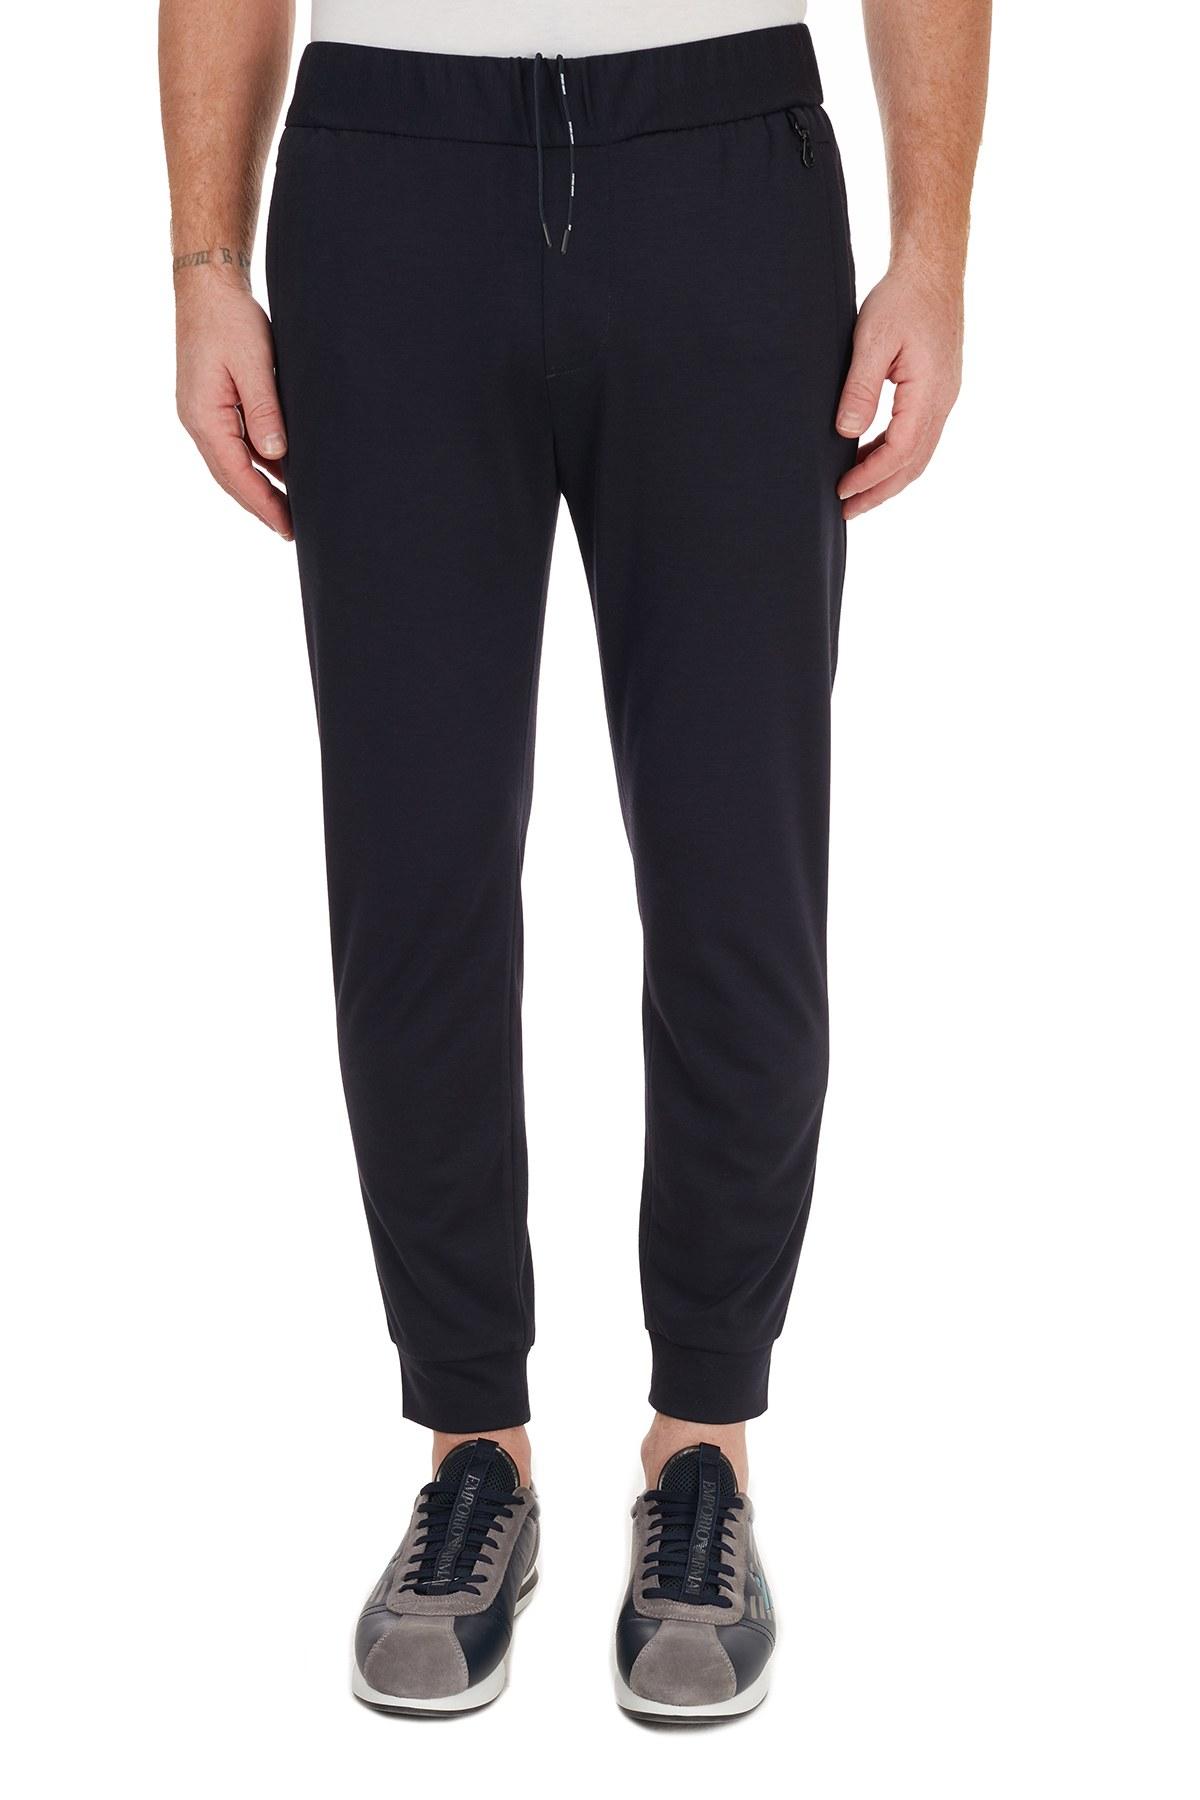 Emporio Armani Regular Fit Jogger Erkek Pantolon 6H1P78 1JEZZ 0920 LACİVERT